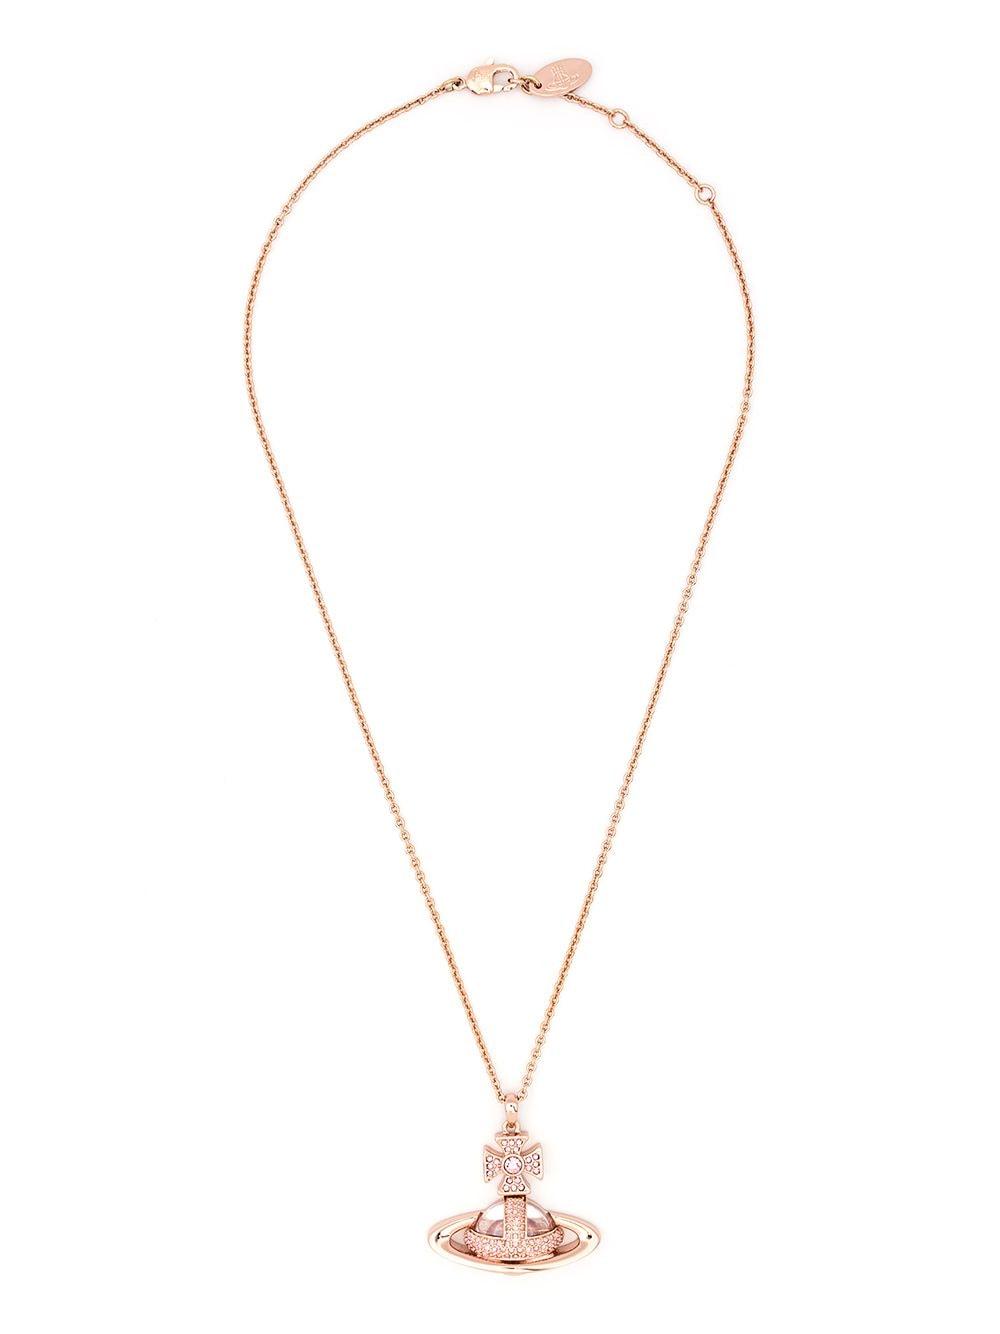 Jewellery Necklaces Vivienne Westwood 63020110 G114 Cn G114